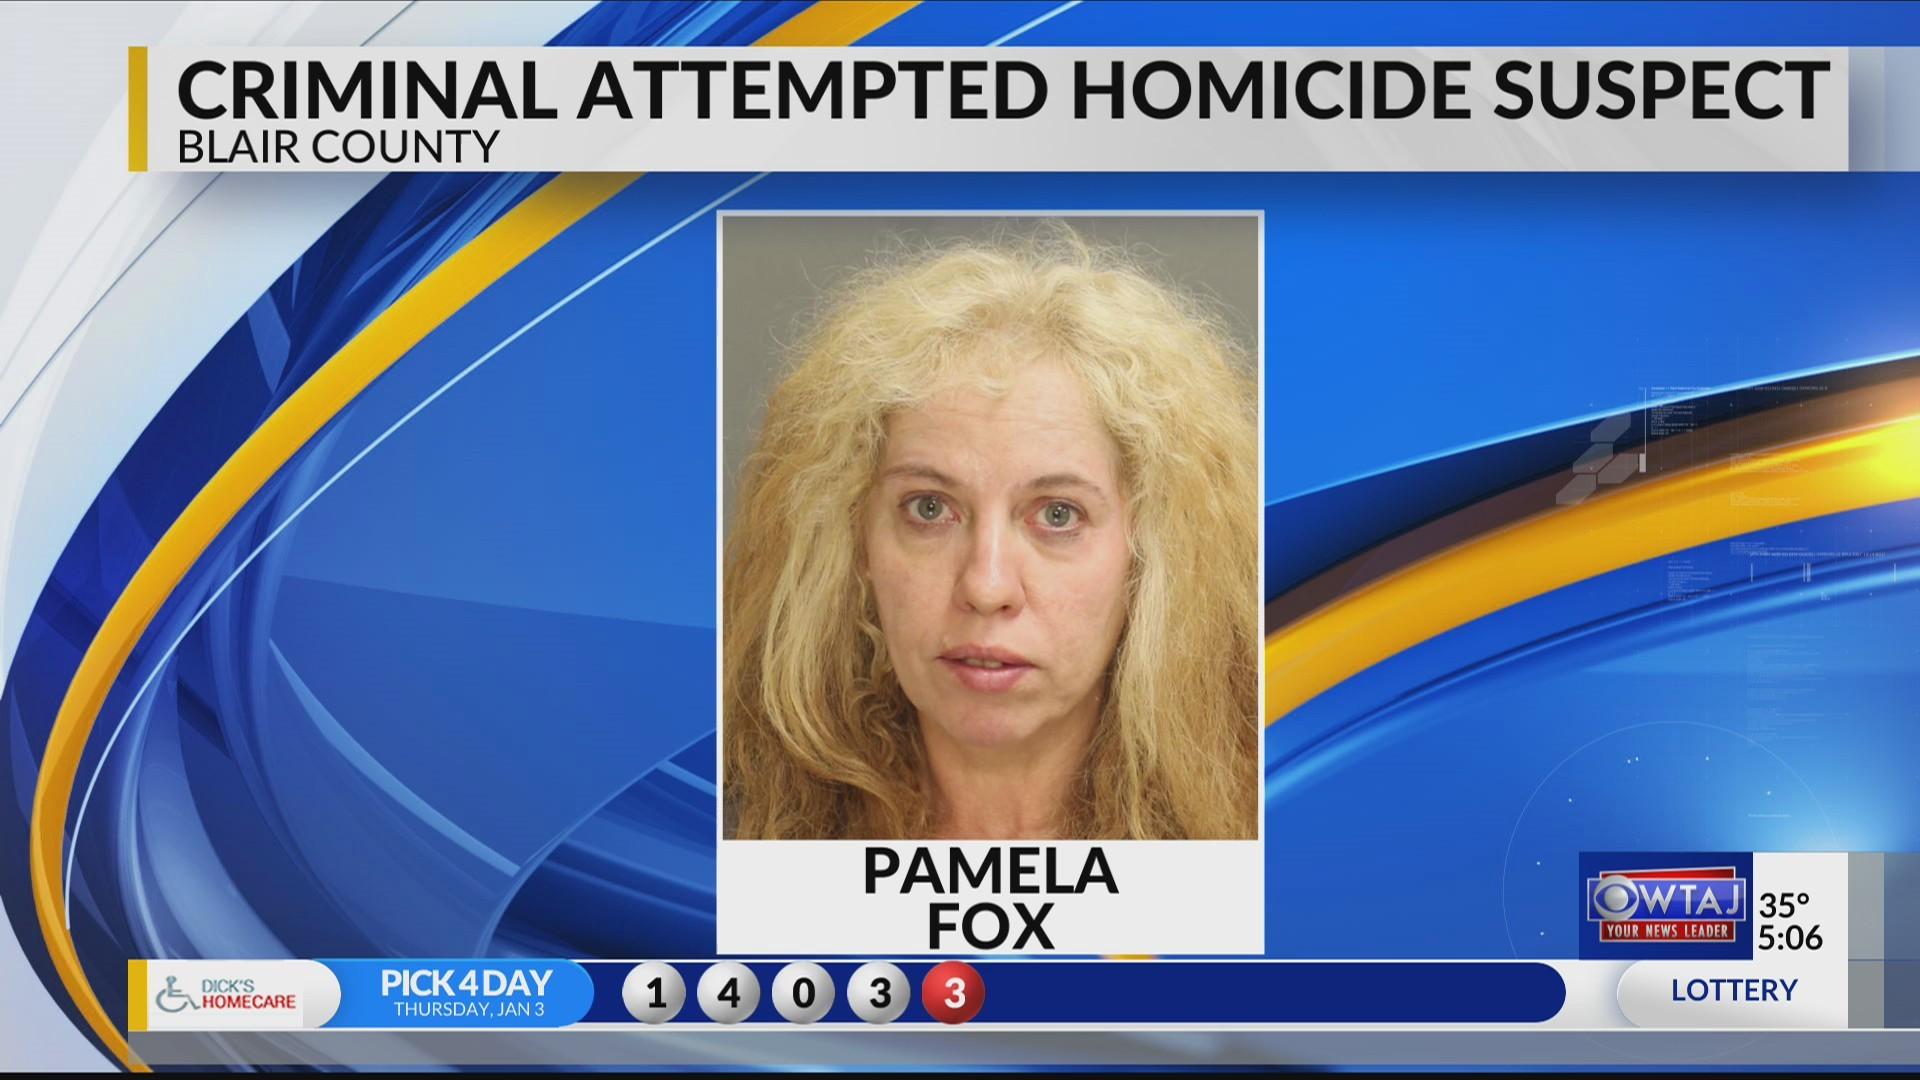 Criminal attempted homicide suspect